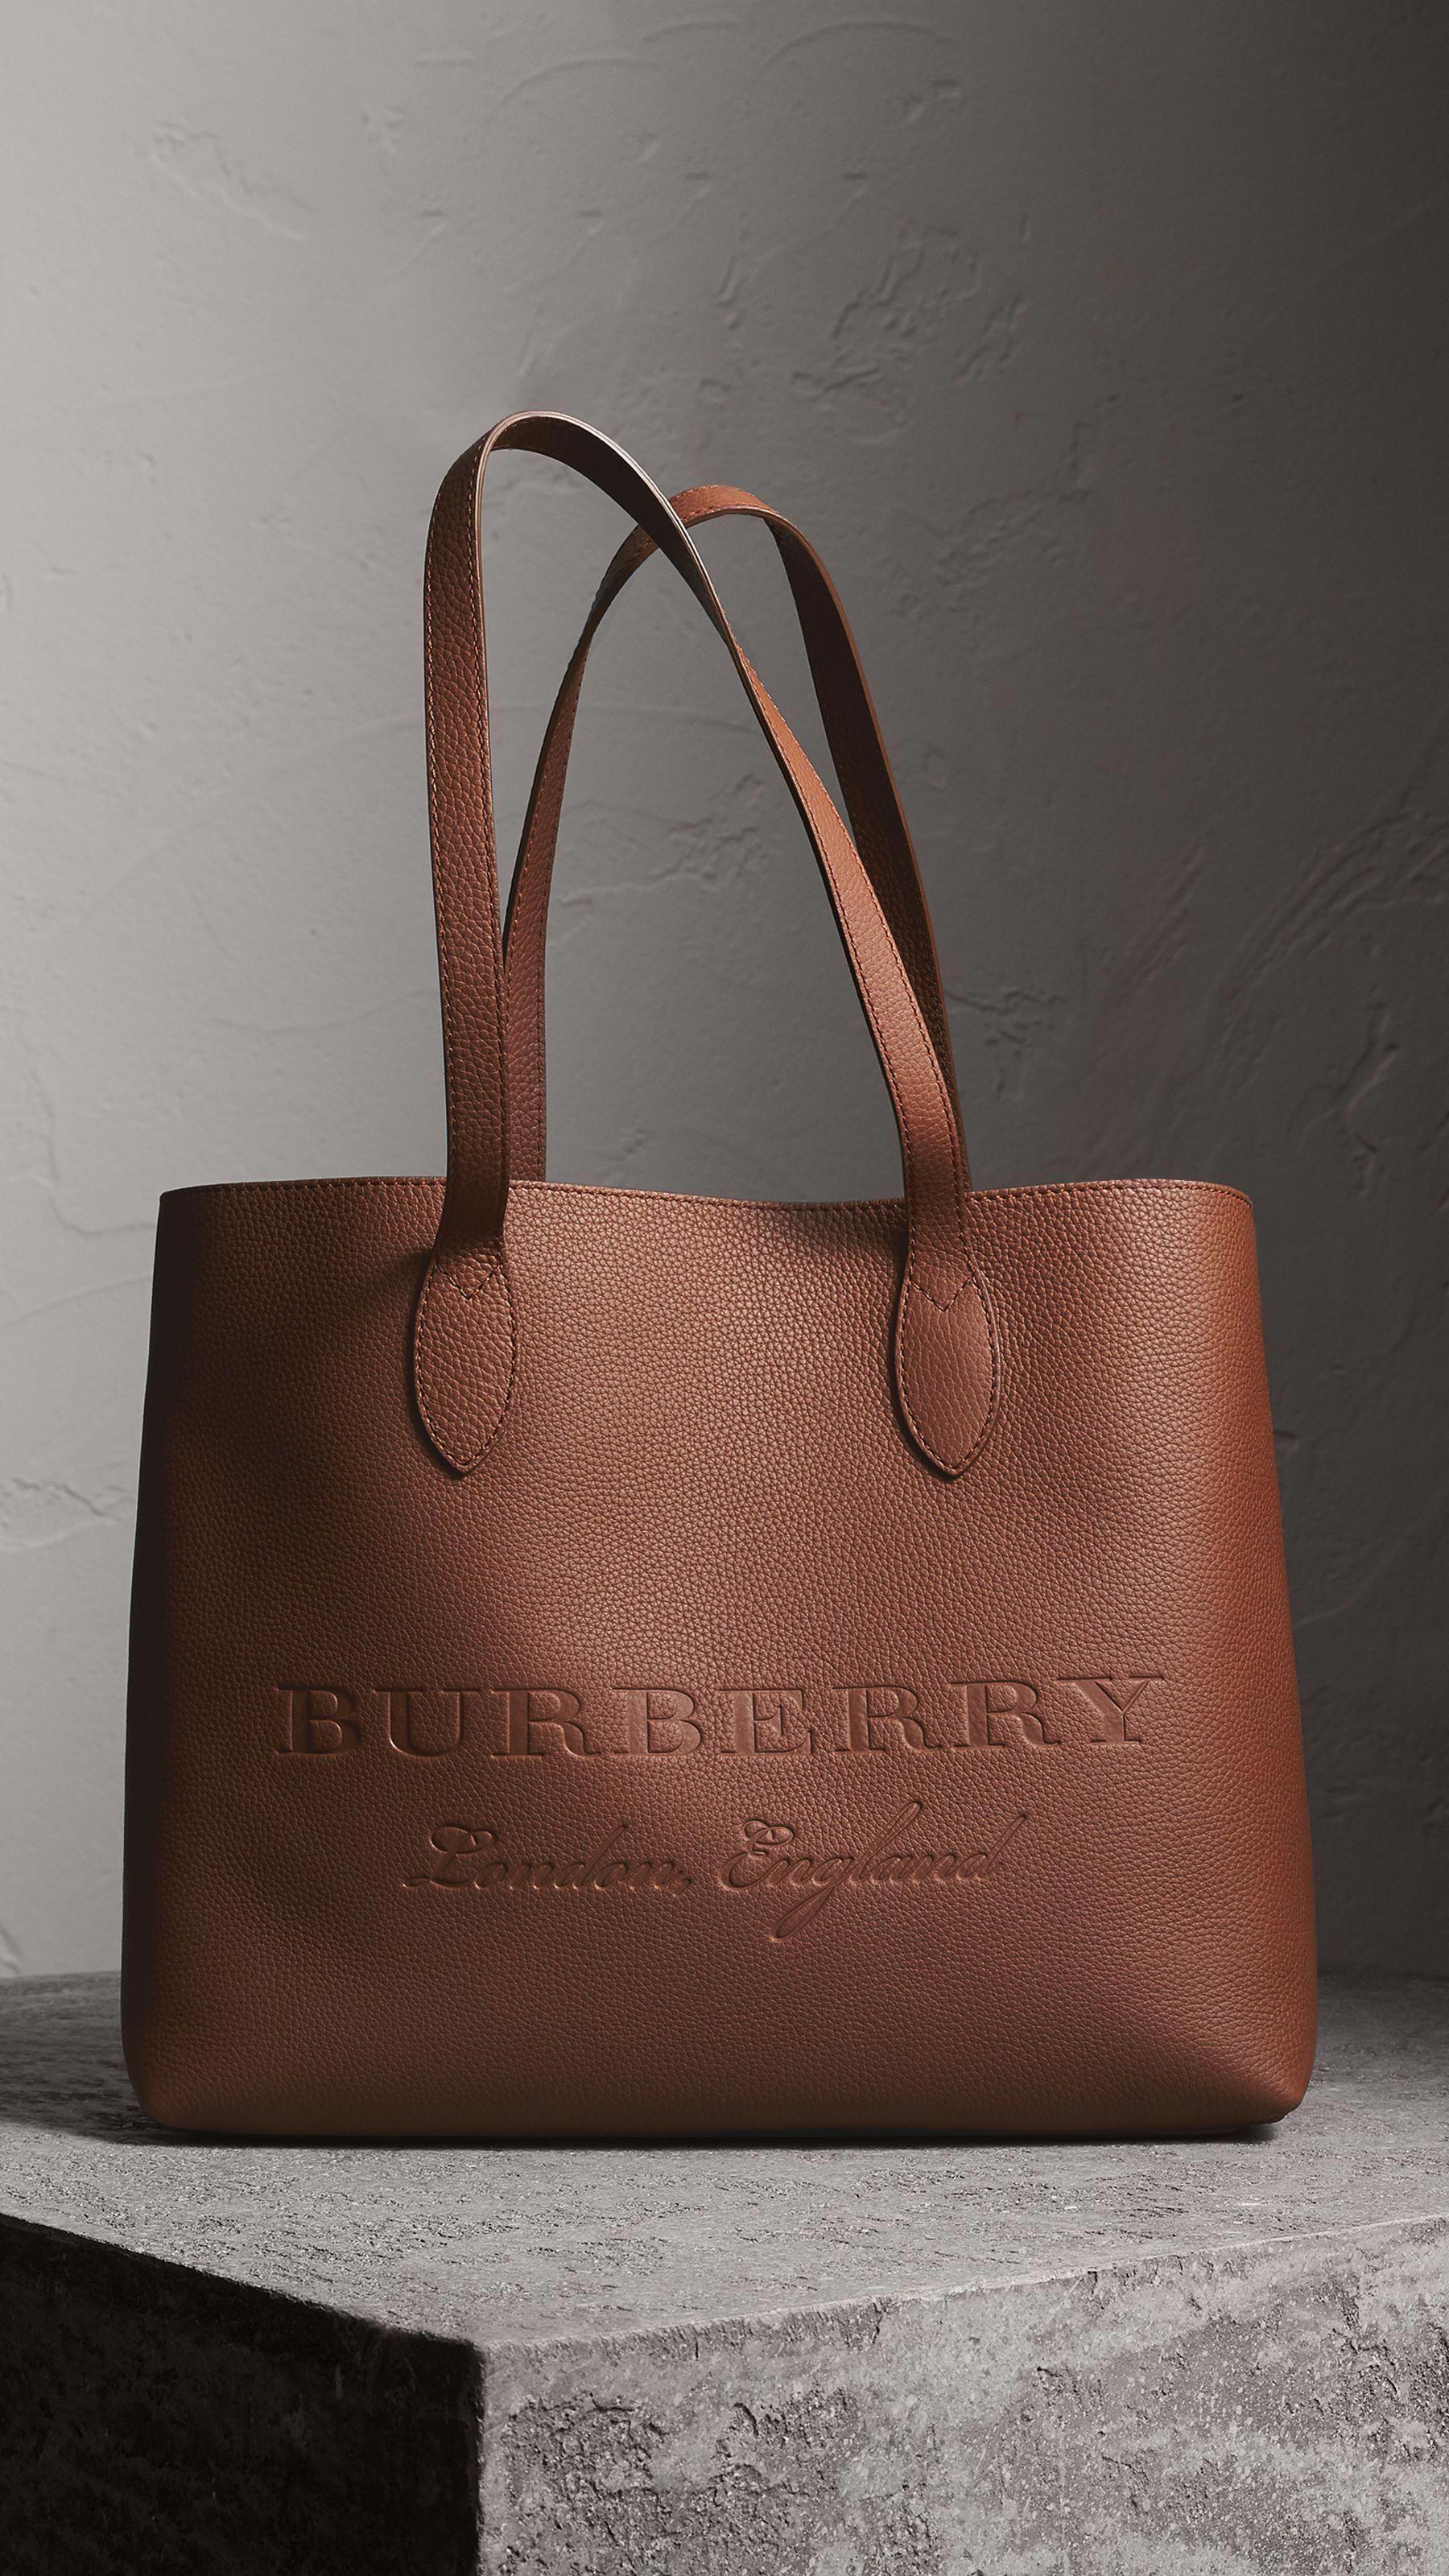 dad811942d061 burberry handbags ebay uk #Pradahandbags   Burberry handbags in .